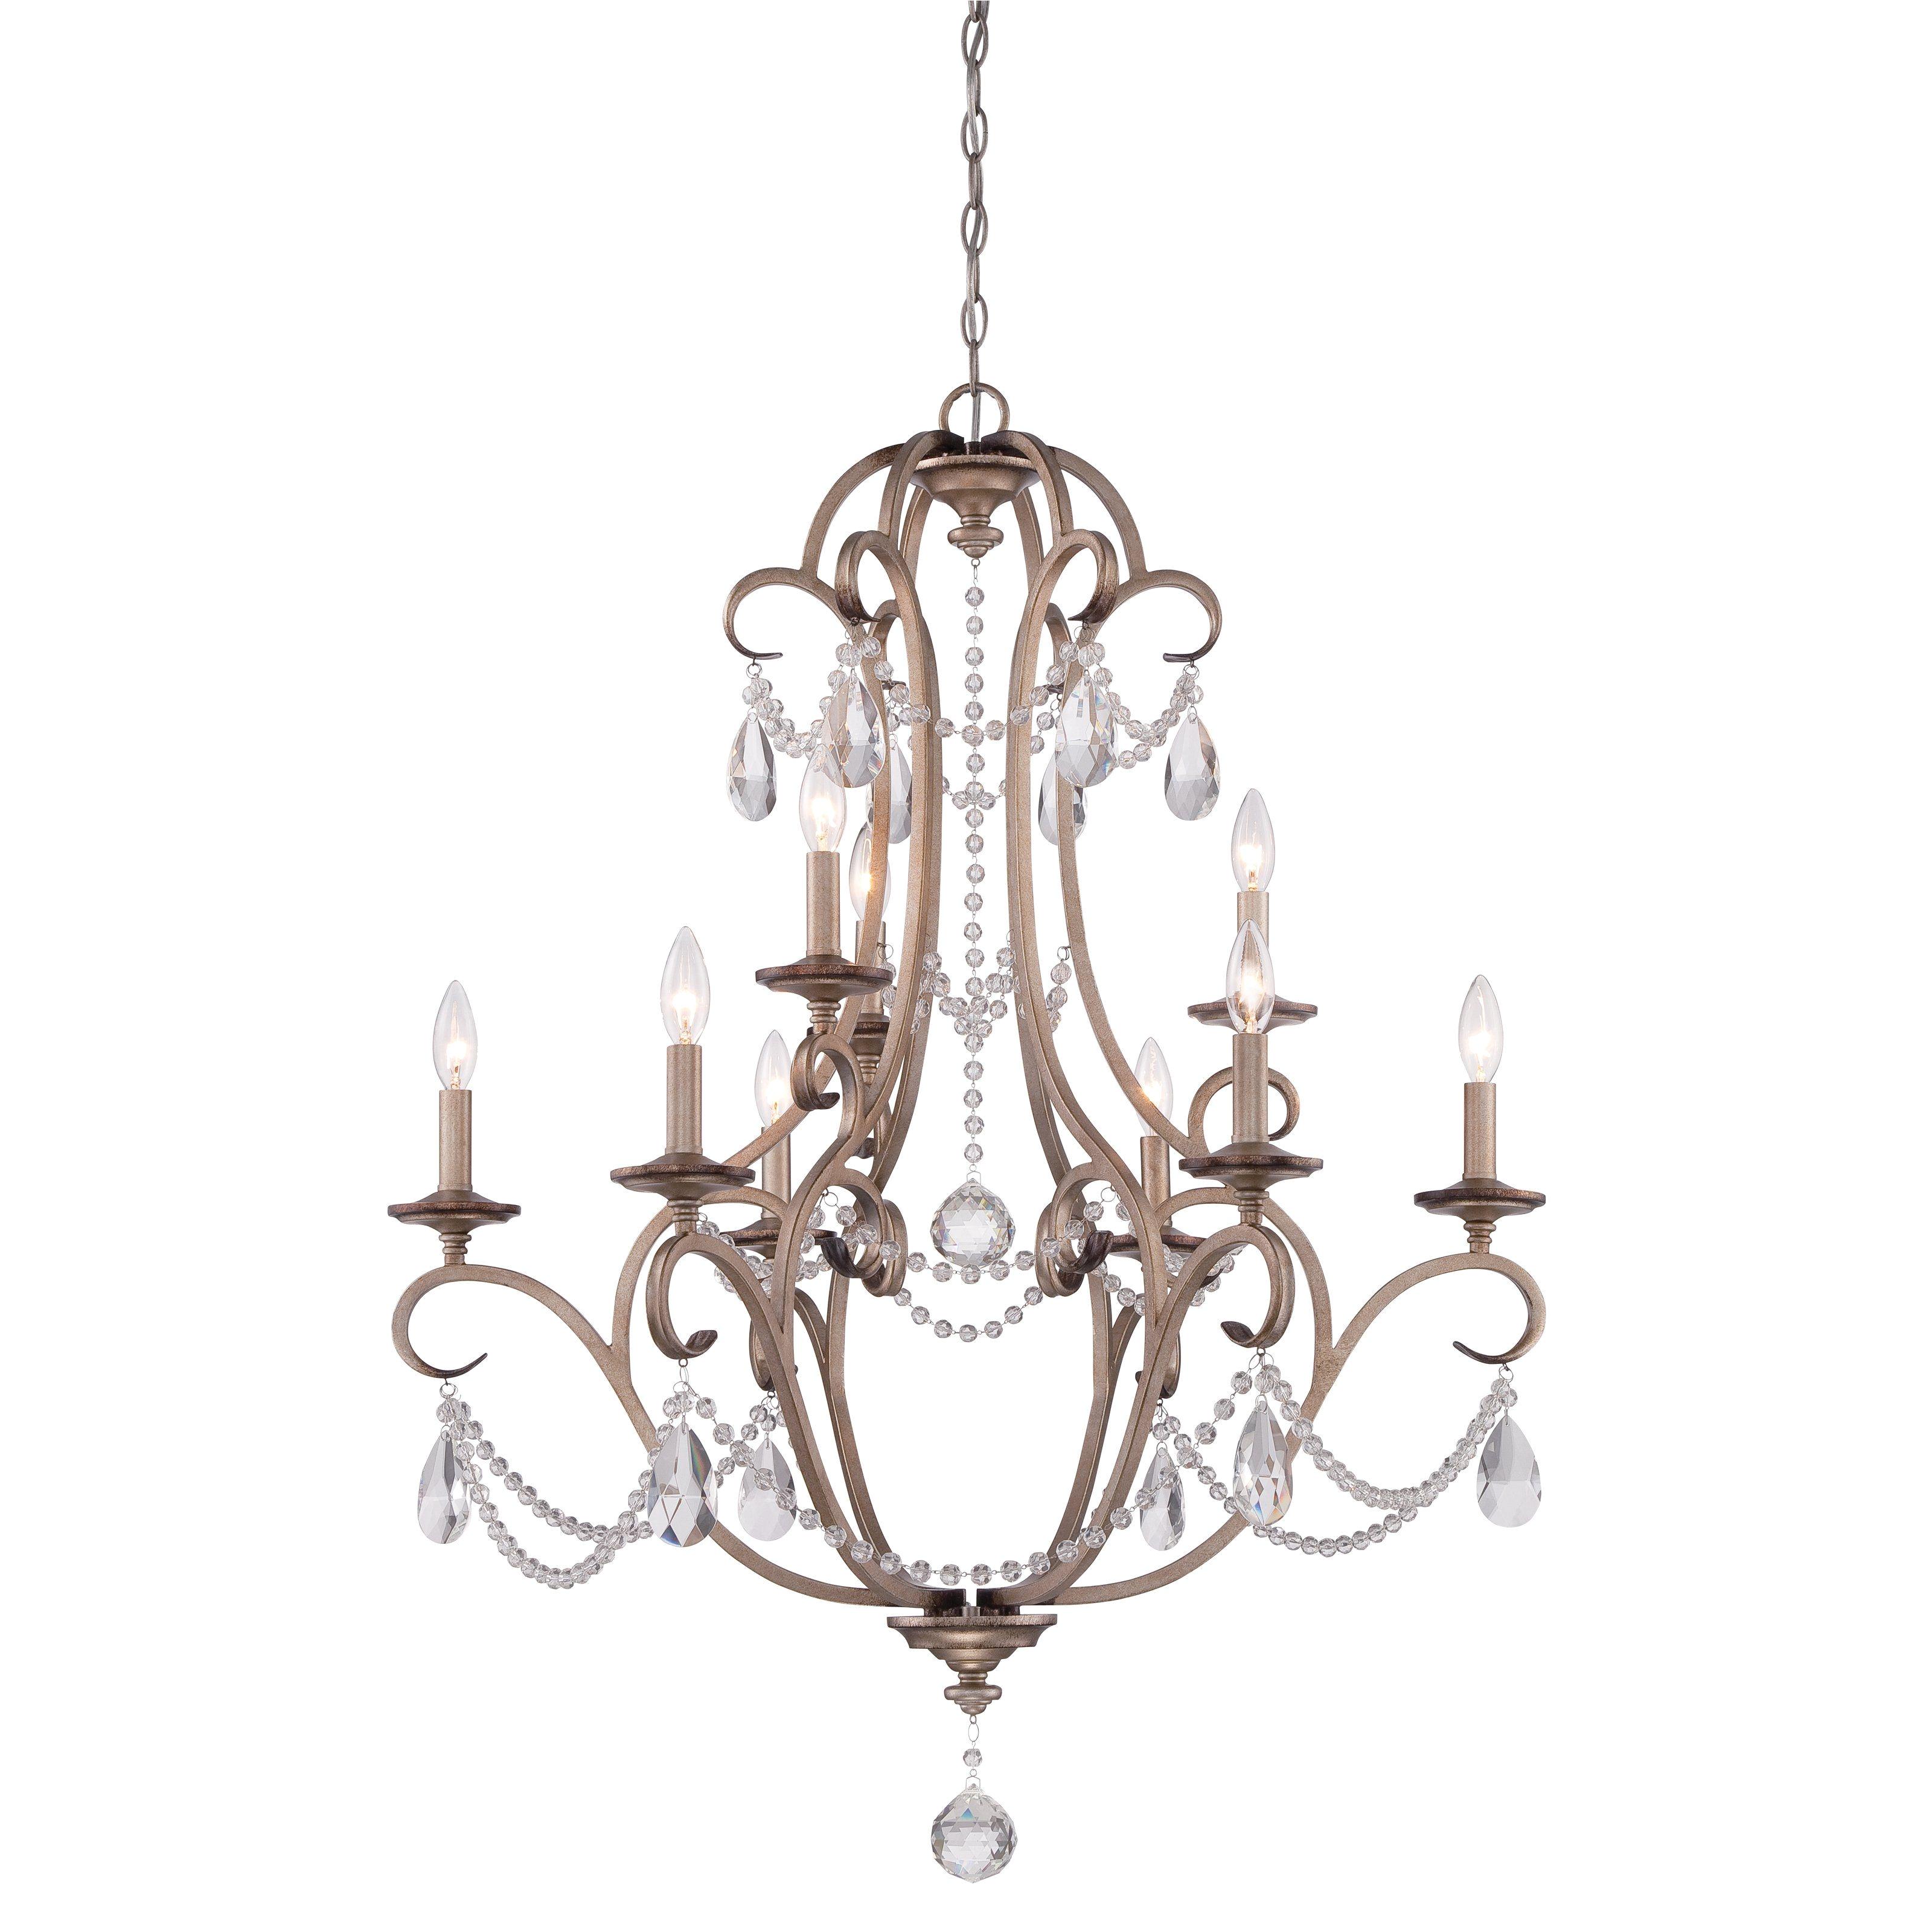 Designers Fountain Gala 9 Light Chandelier $898